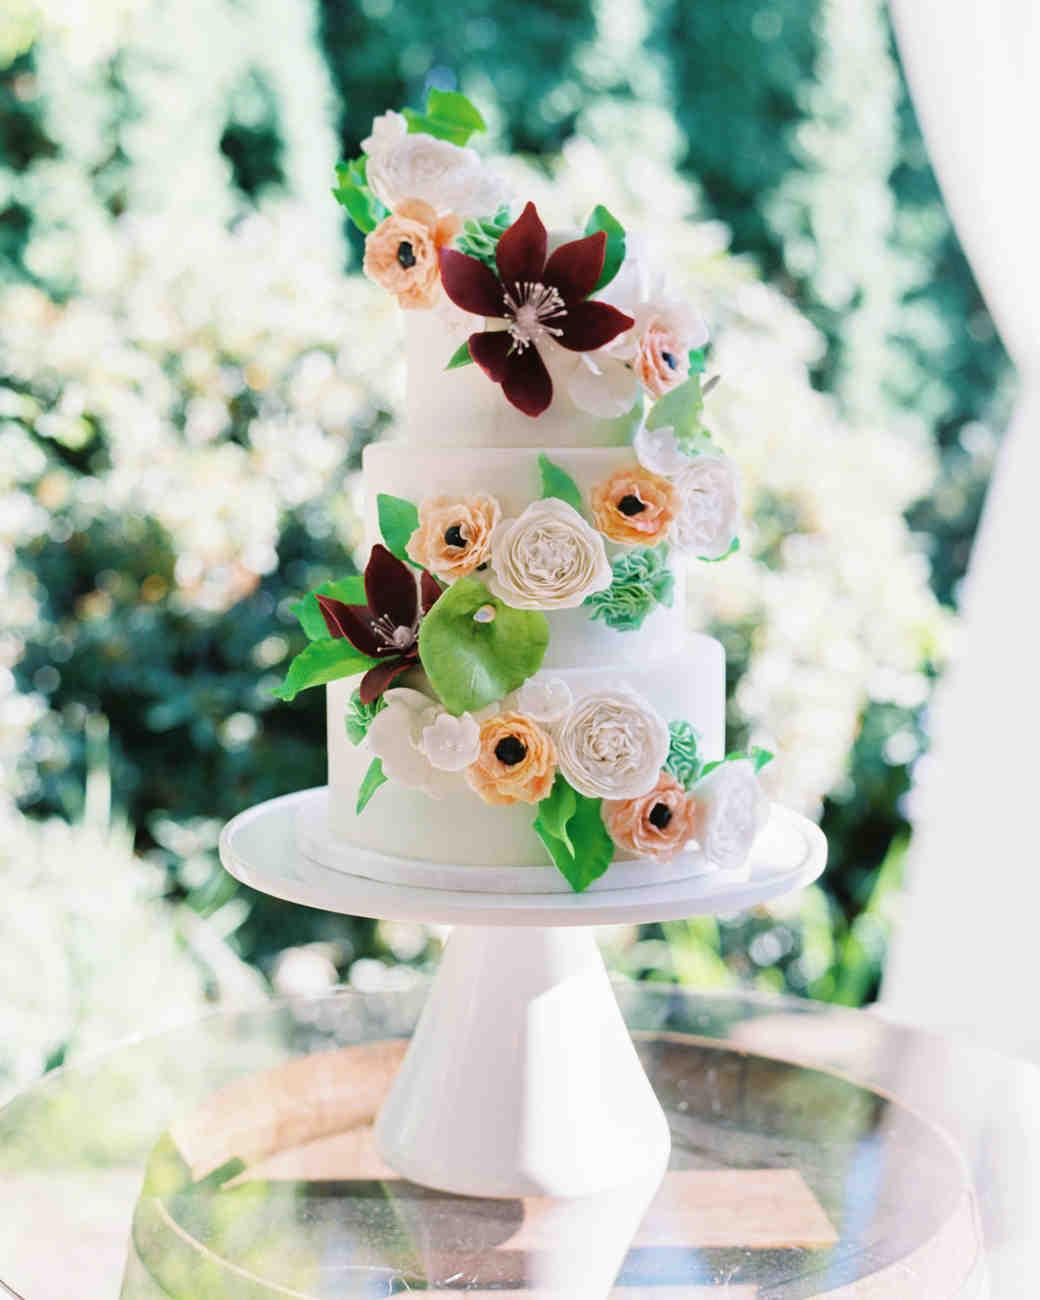 paige matt wedding cake with flowers